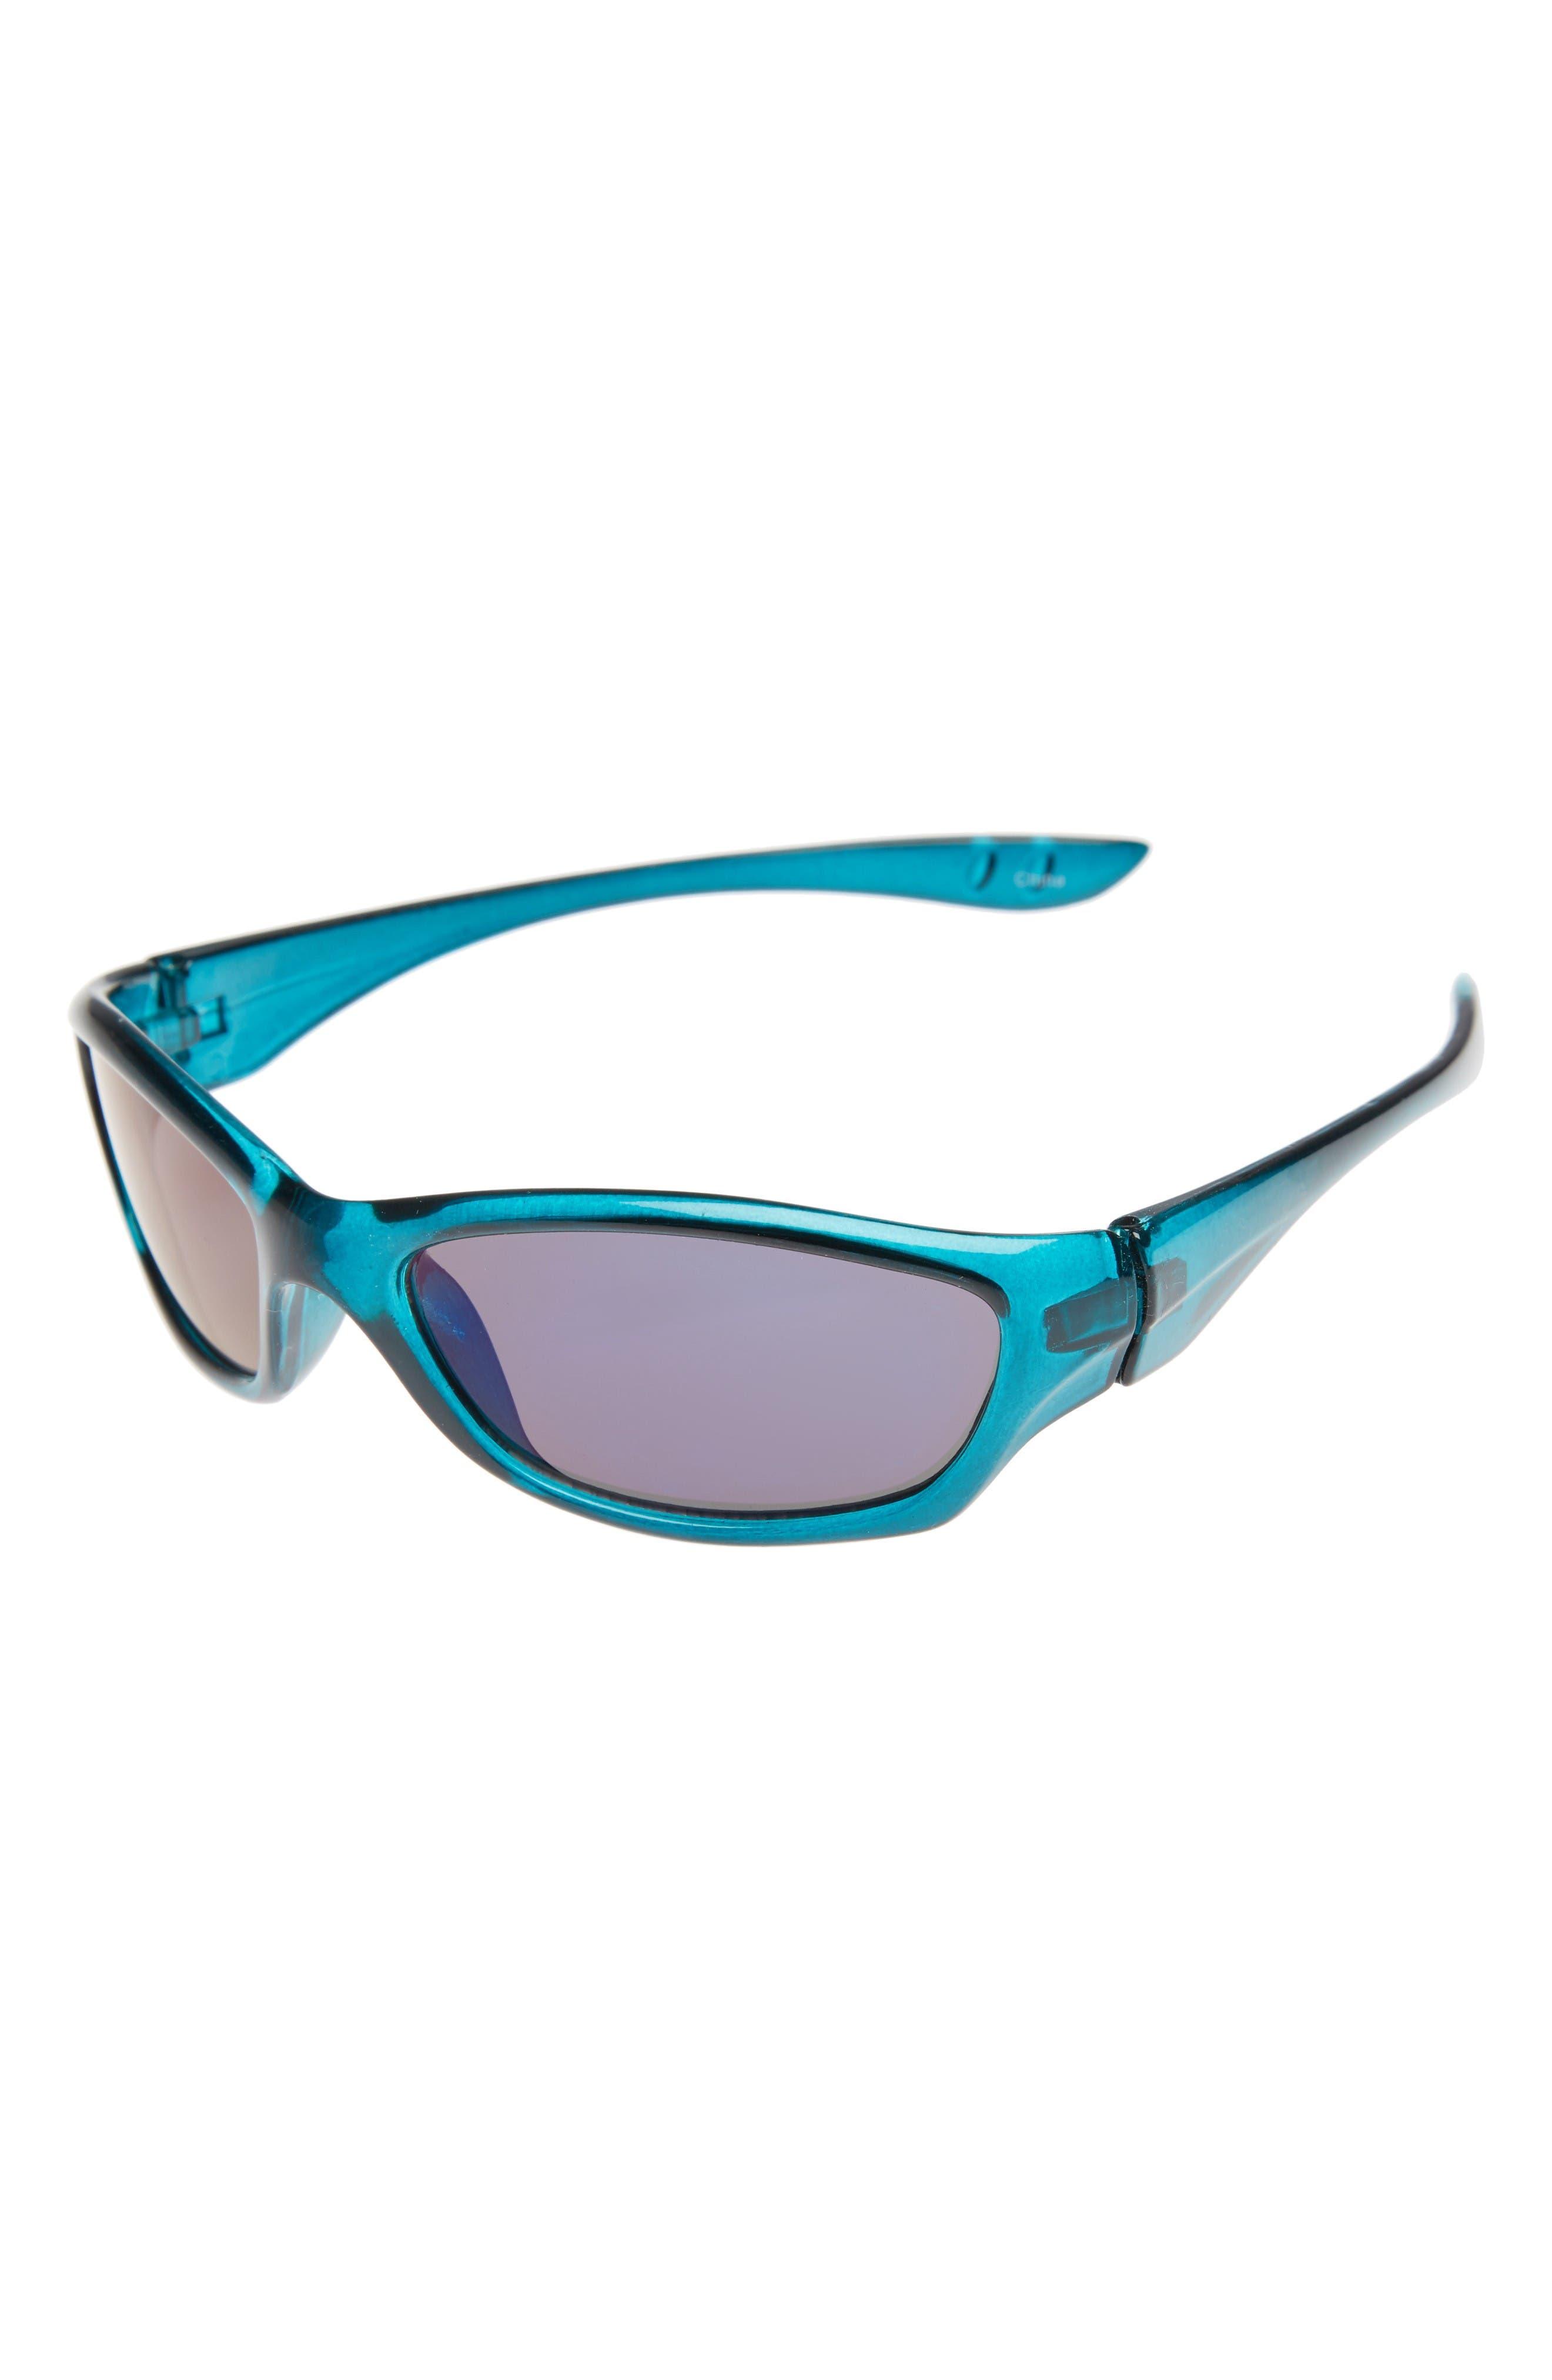 icon eyewear sunglasses boys nordstrom